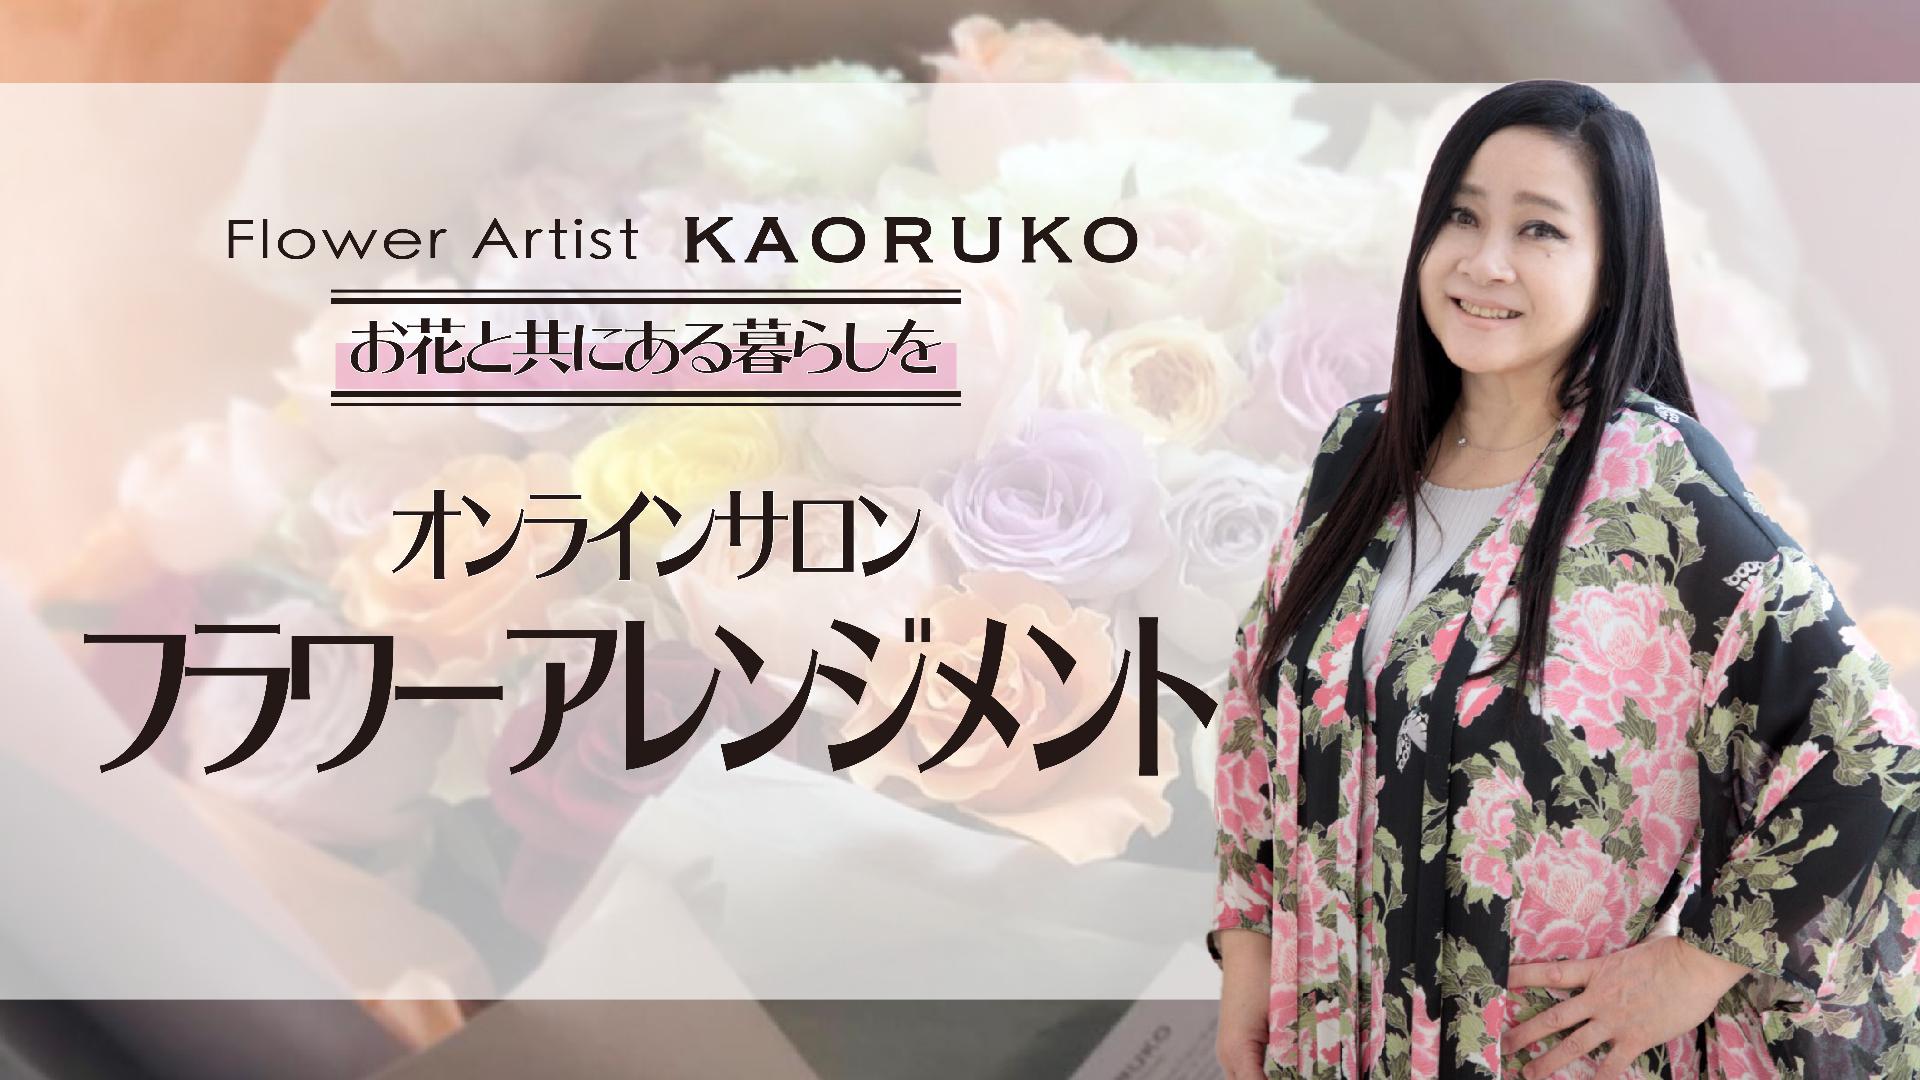 KAORUKO フラワーアレンジメント